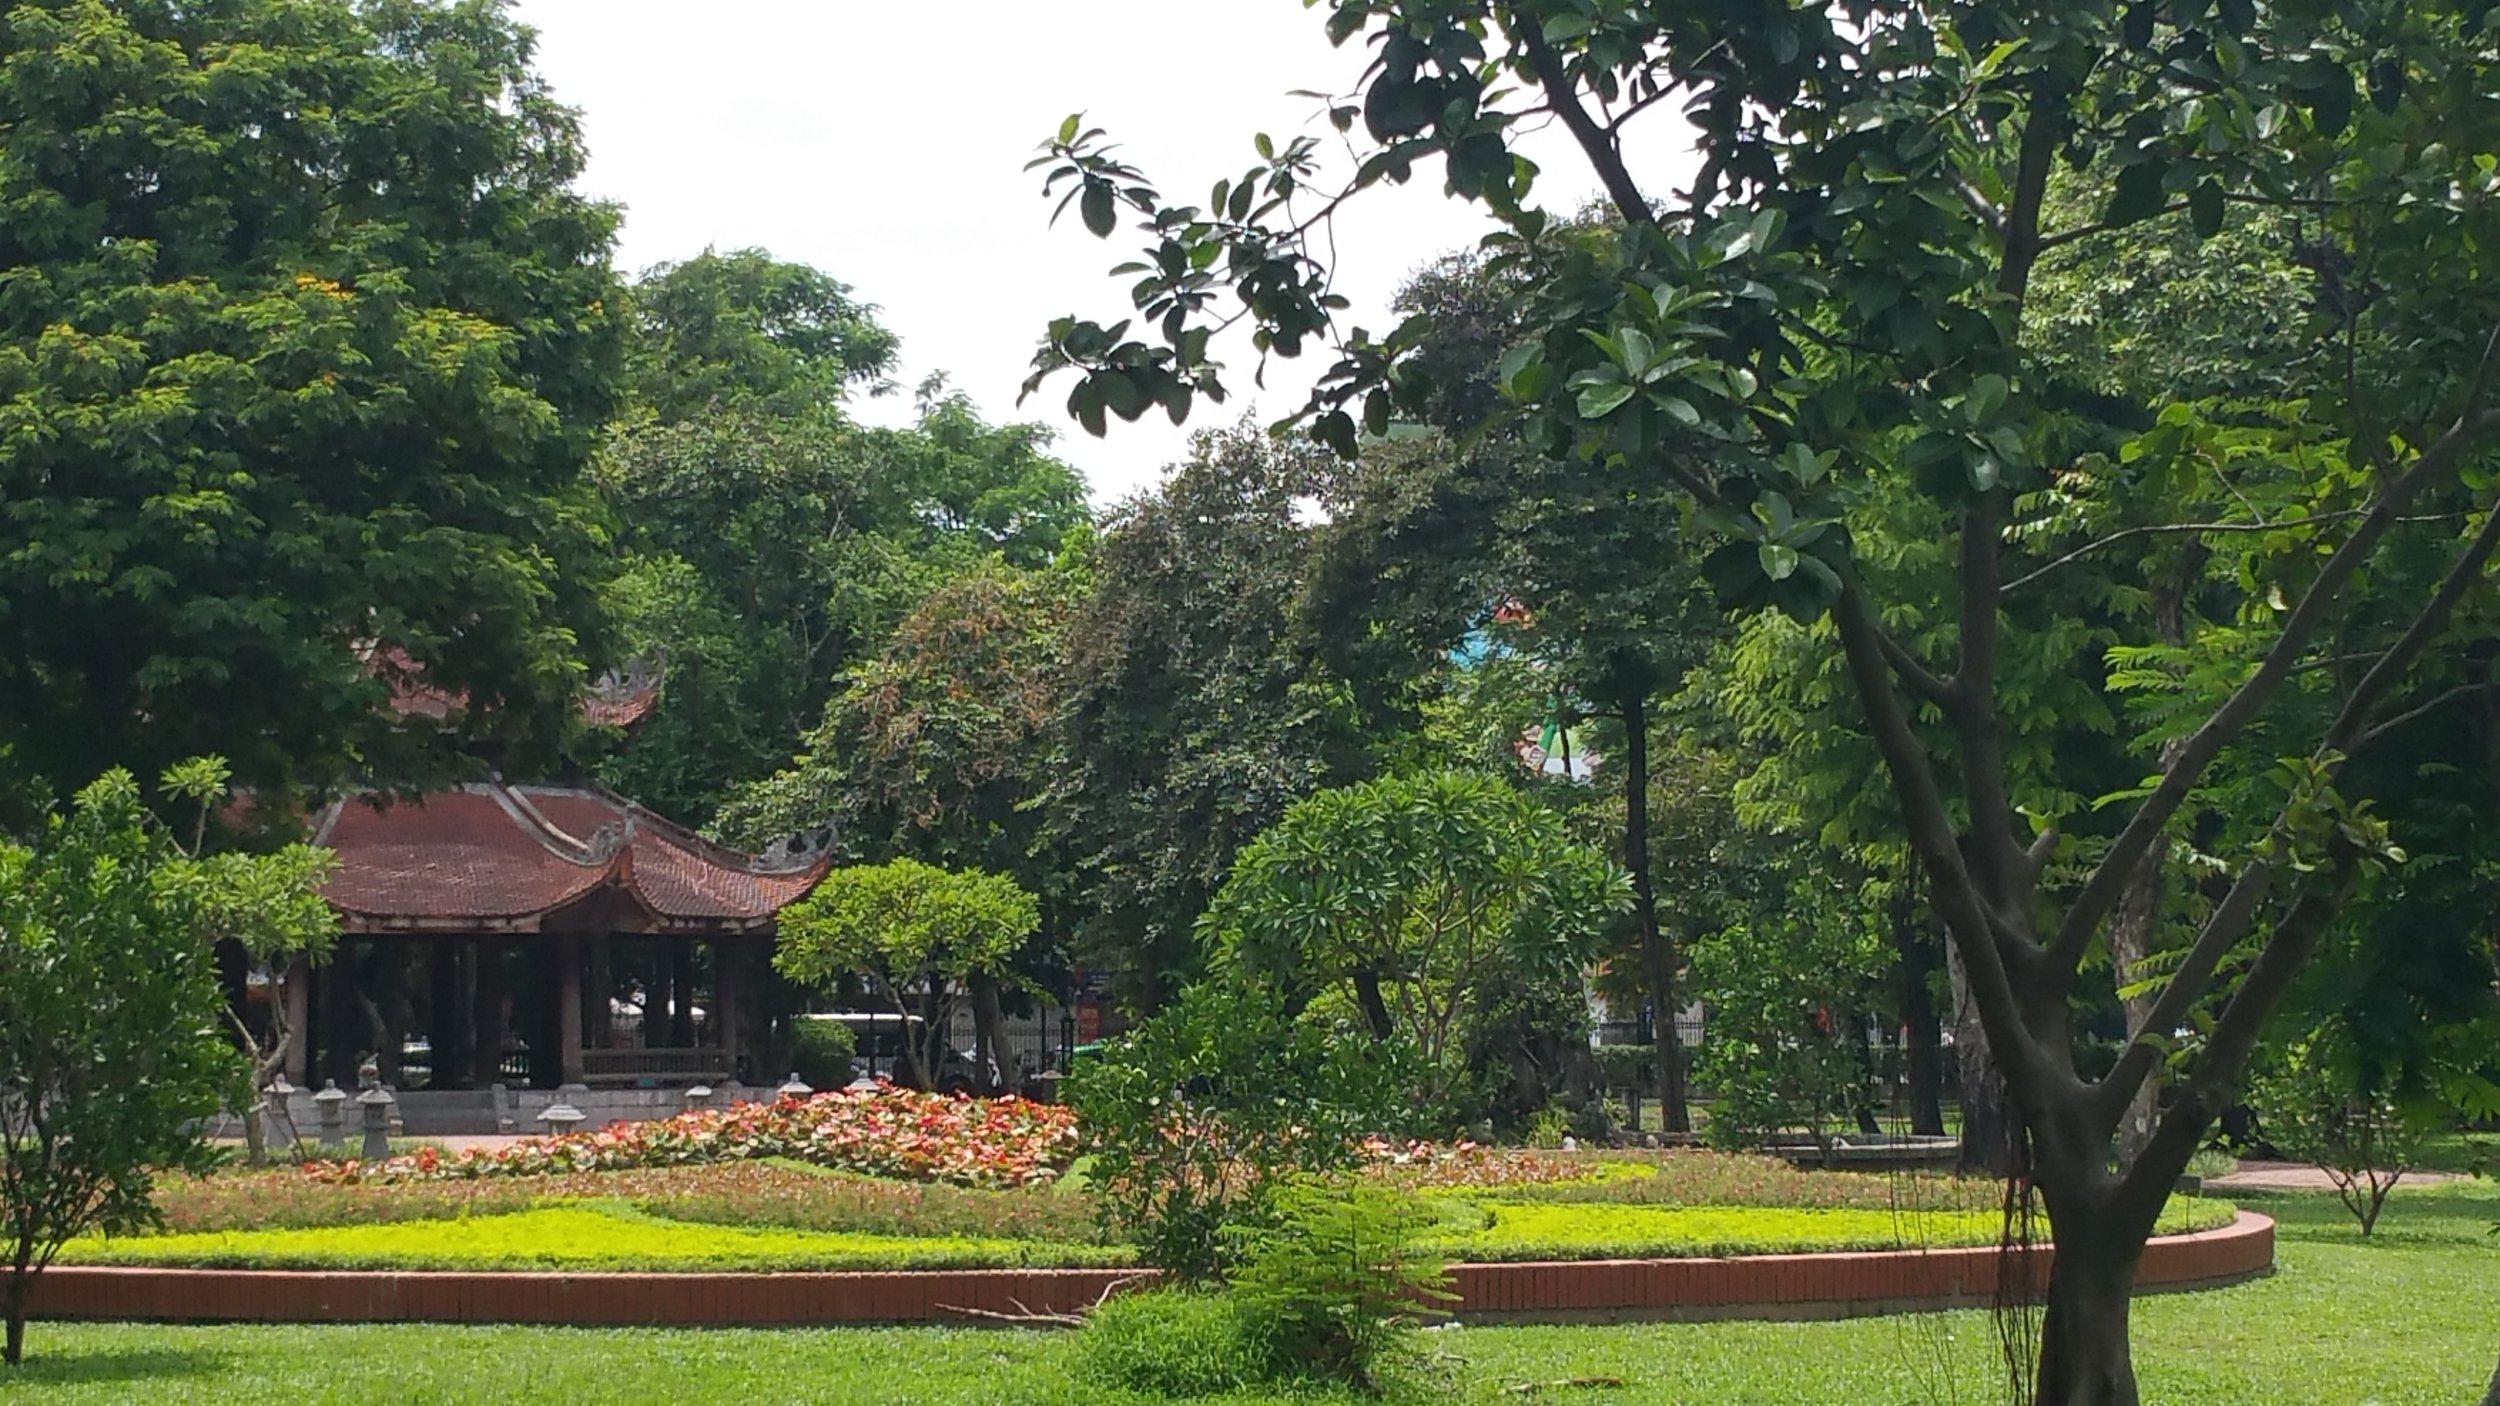 Communist countries have amazing parks.